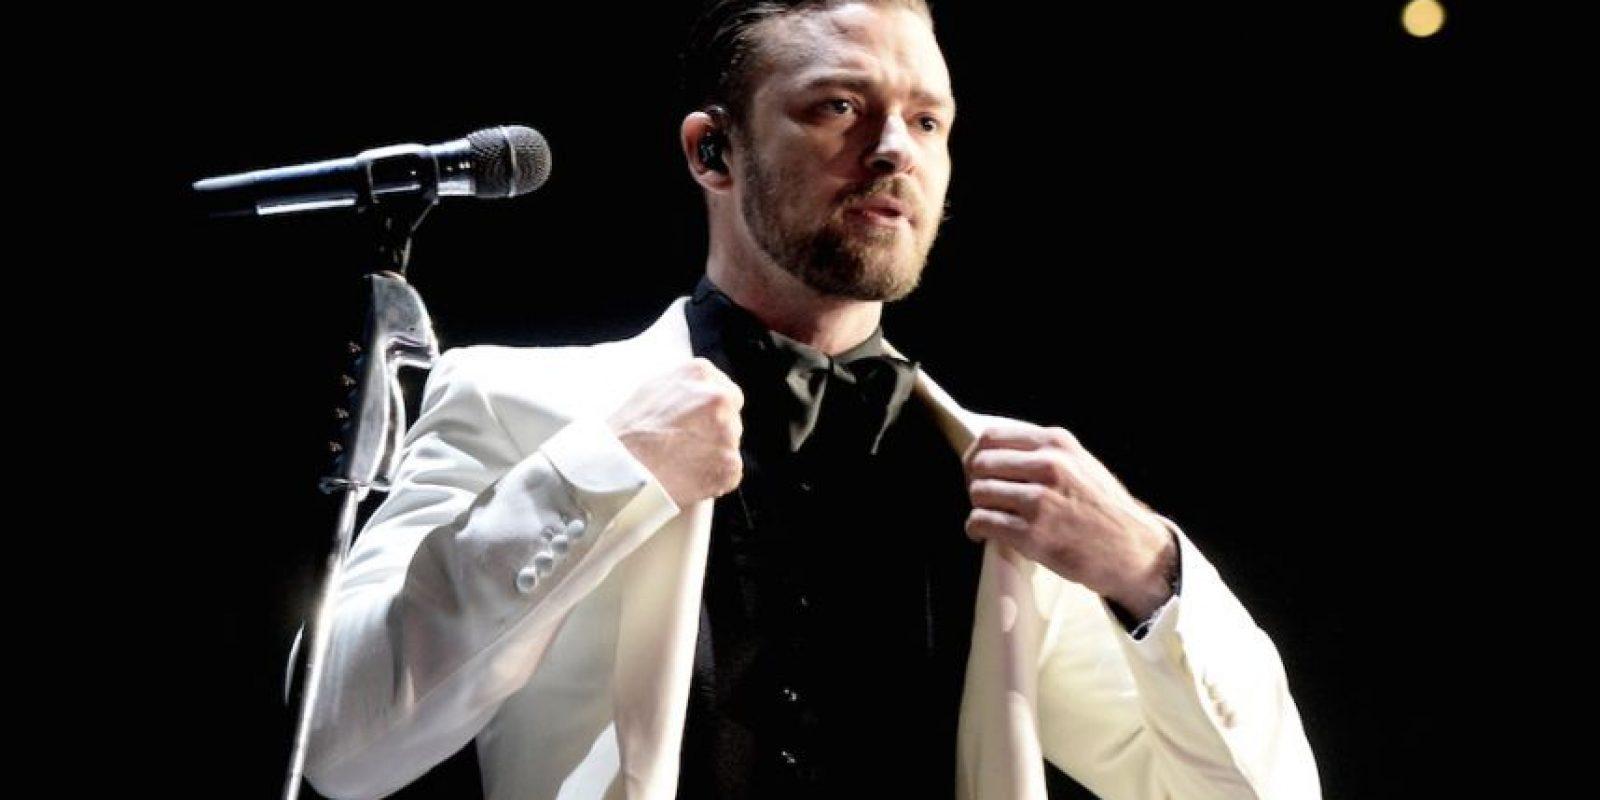 7) Justin Timberlake @jtimberlake – Más de 48 millones 855 mil seguidores. Foto:Getty Images